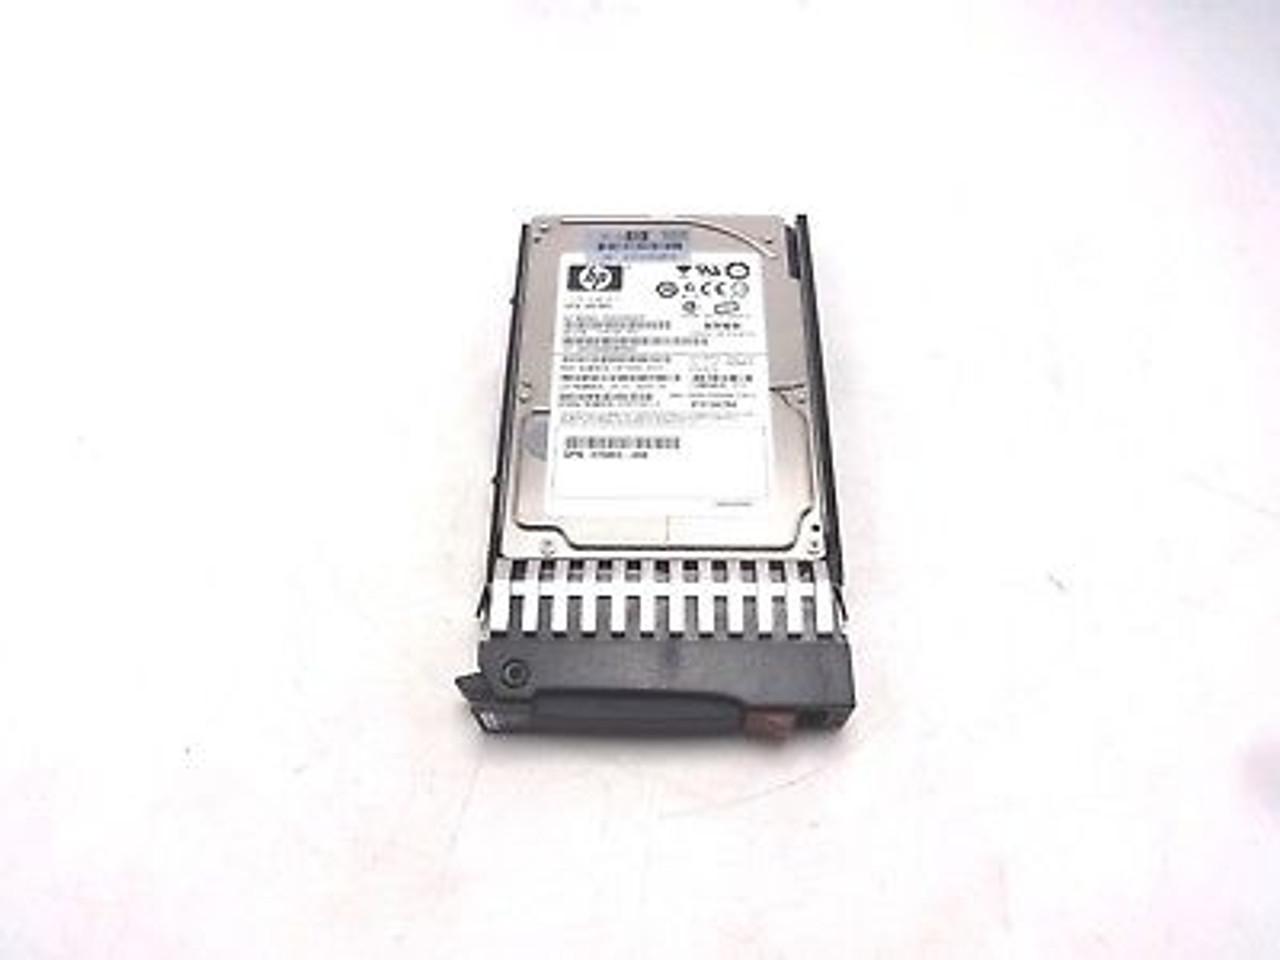 HP 486824-001 72GB 10K SAS 2.5 DP HDD 430165-002 9F4066-035 375863-008